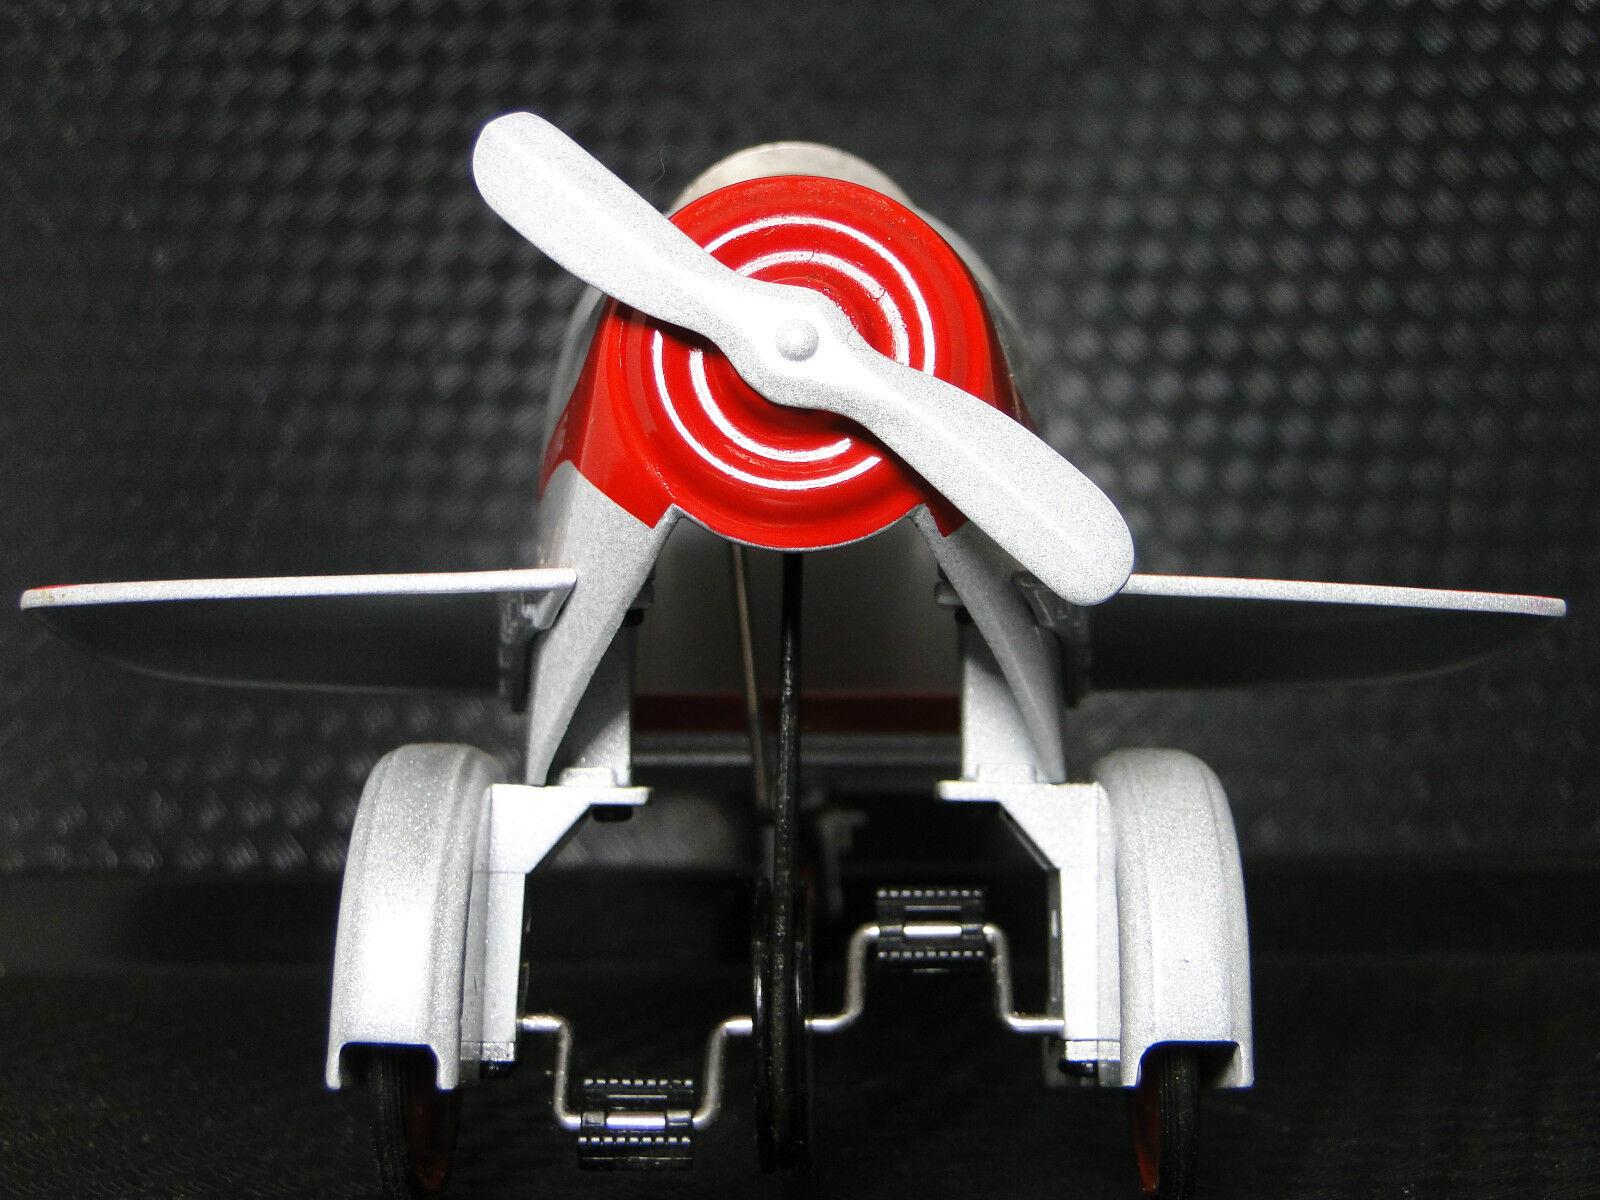 Pedal de plano de aire coche Segunda Guerra Mundial Mustang avión Metal staronwing leer la descripción completa